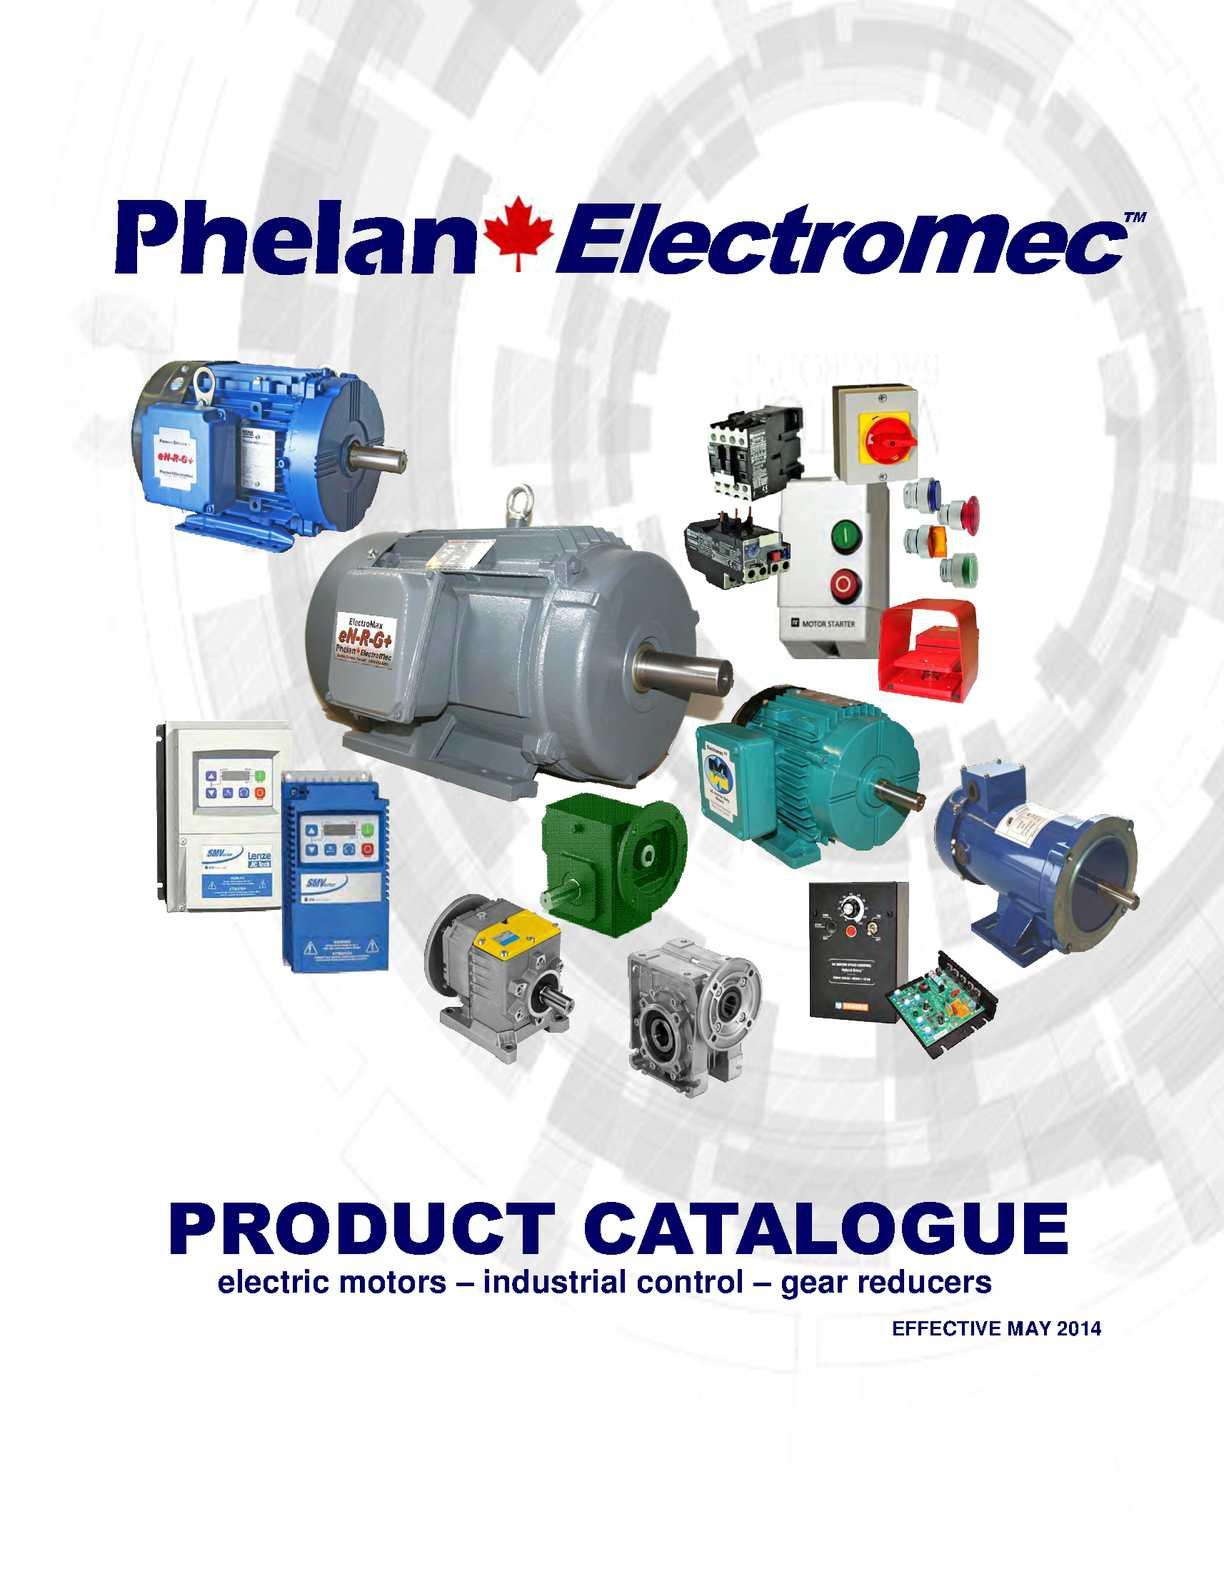 Calamo Phelan Electromec Product Catalogue Bodine Electric Motor Brushes Replacement Repalcement Parts